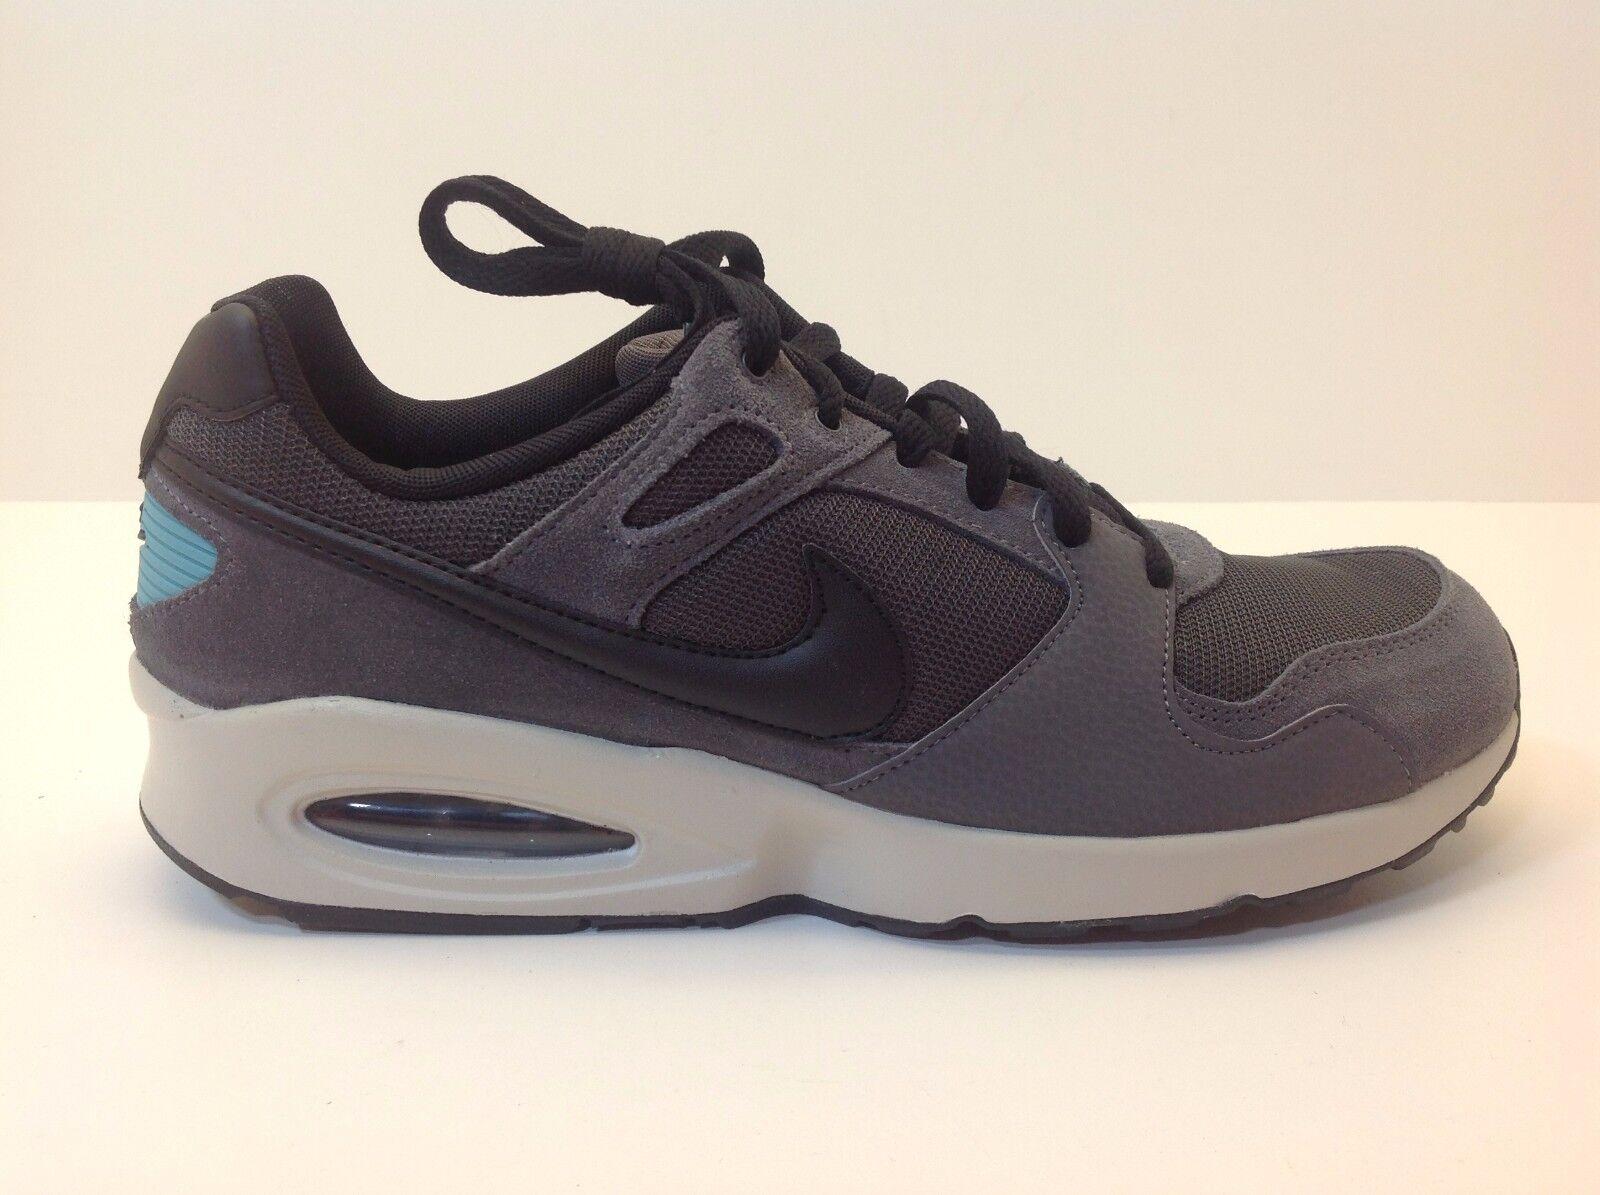 Air Max Coliseum Racer Men's Size 9-12 Dark Grey New in Box 555423 012